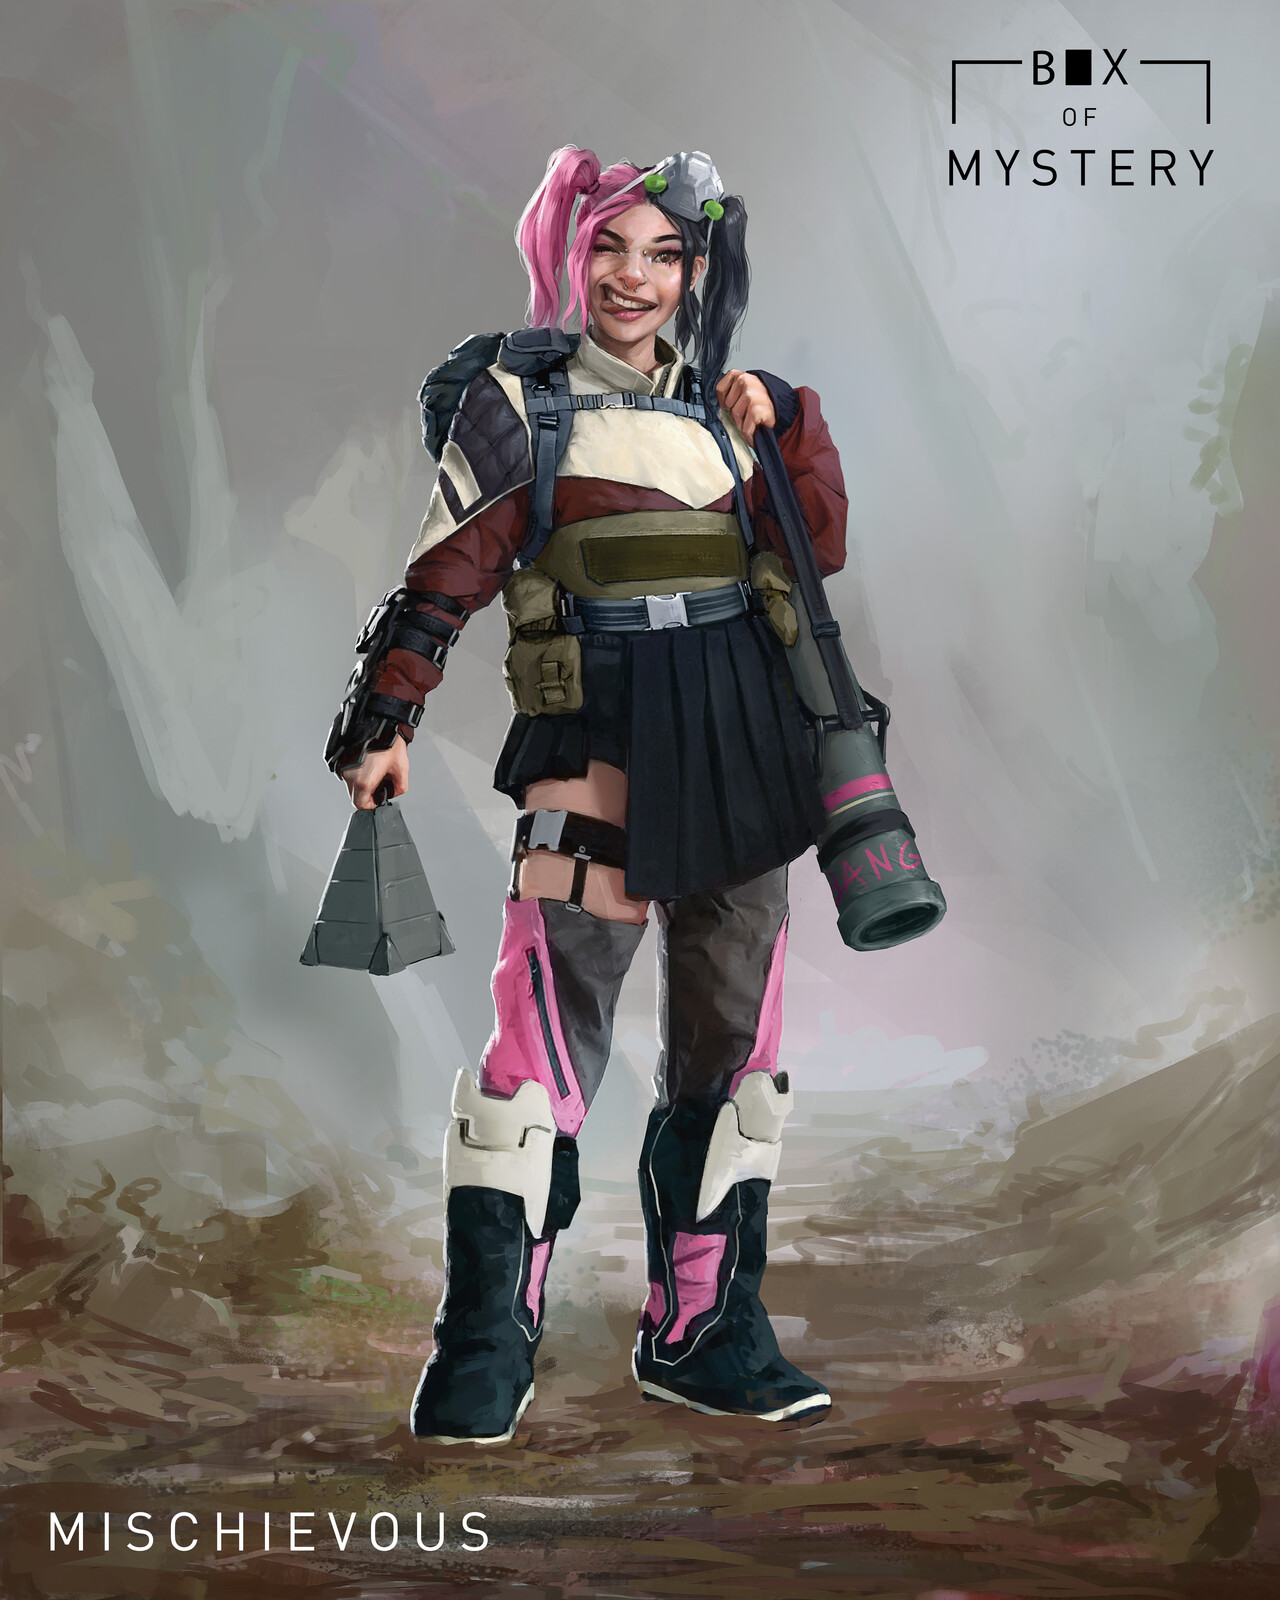 Challenge - Box of Mystery: Mischievous